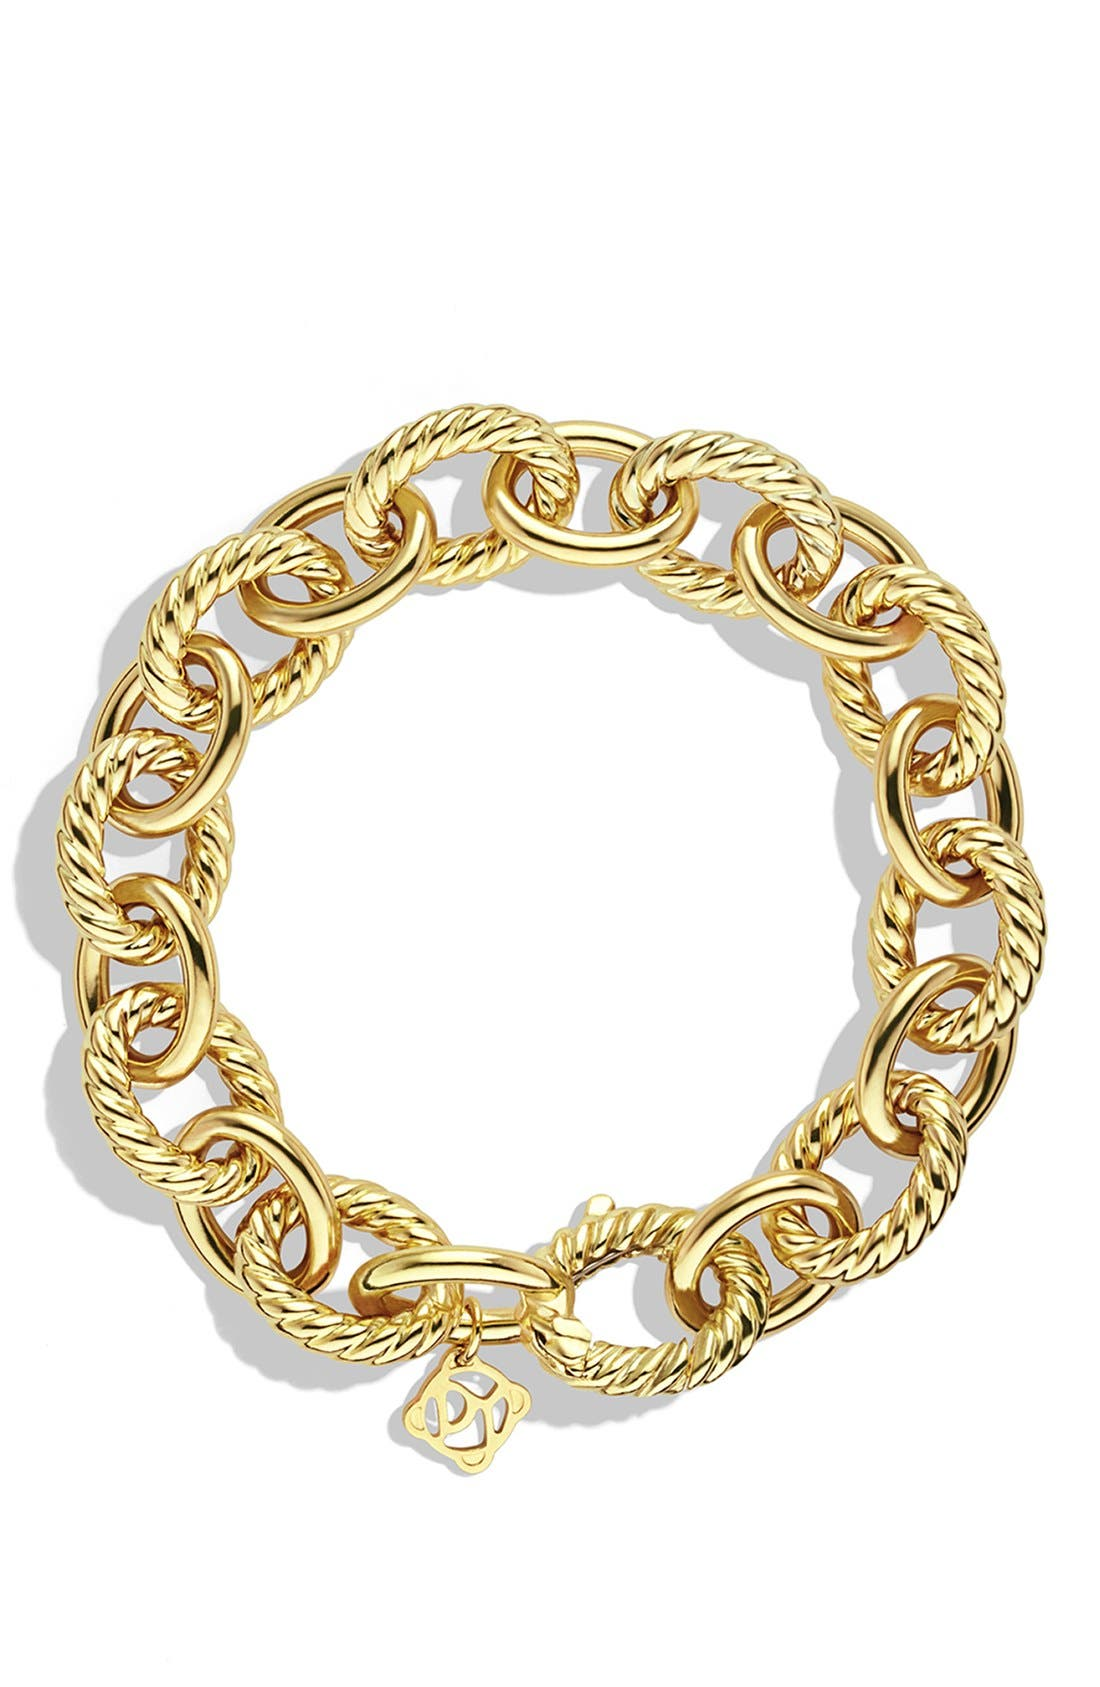 Alternate Image 2  - David Yurman 'Oval' Large Link Bracelet in Gold